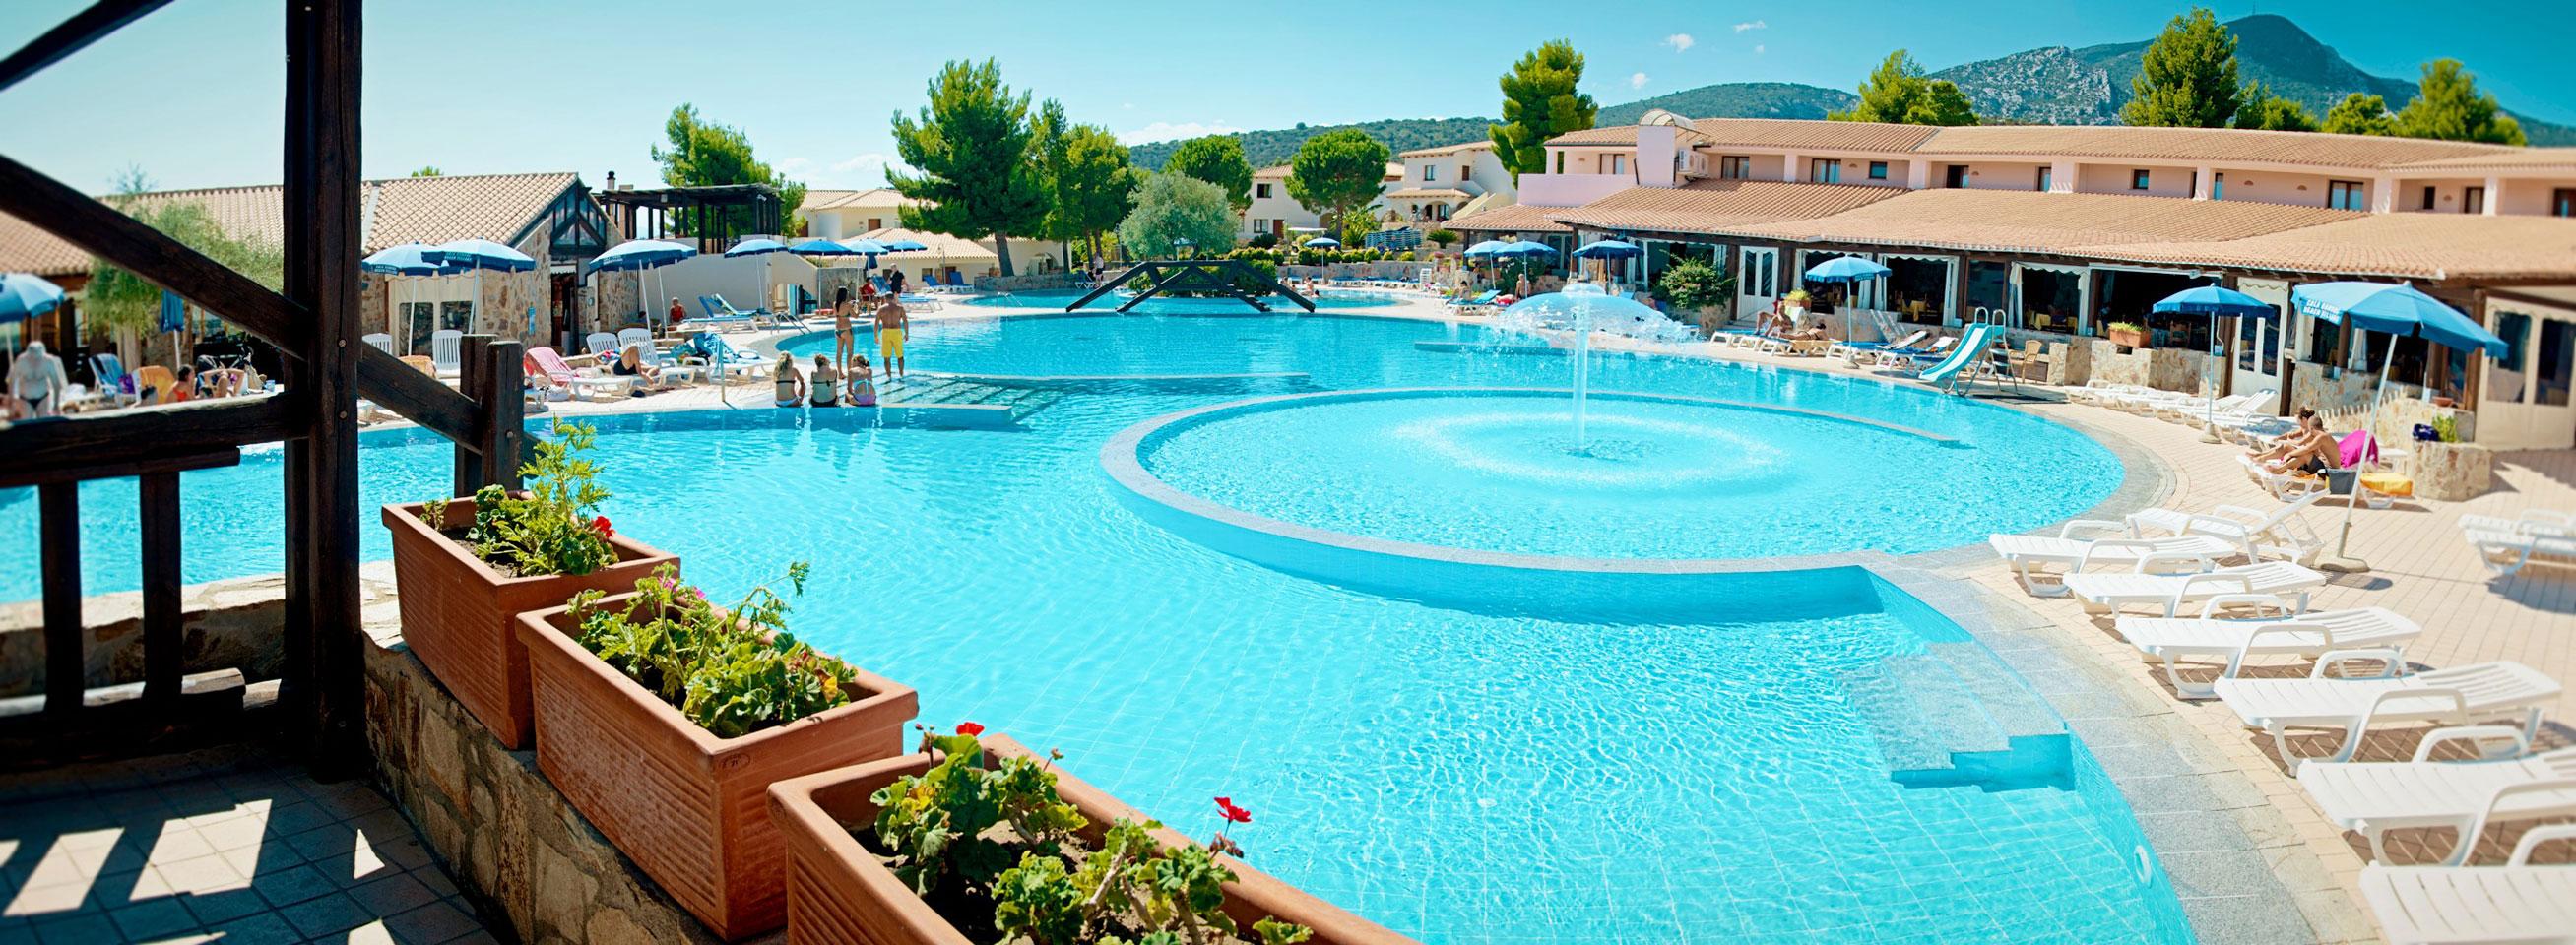 Hotel Cala Gonone Beach Village - Cala Gonone